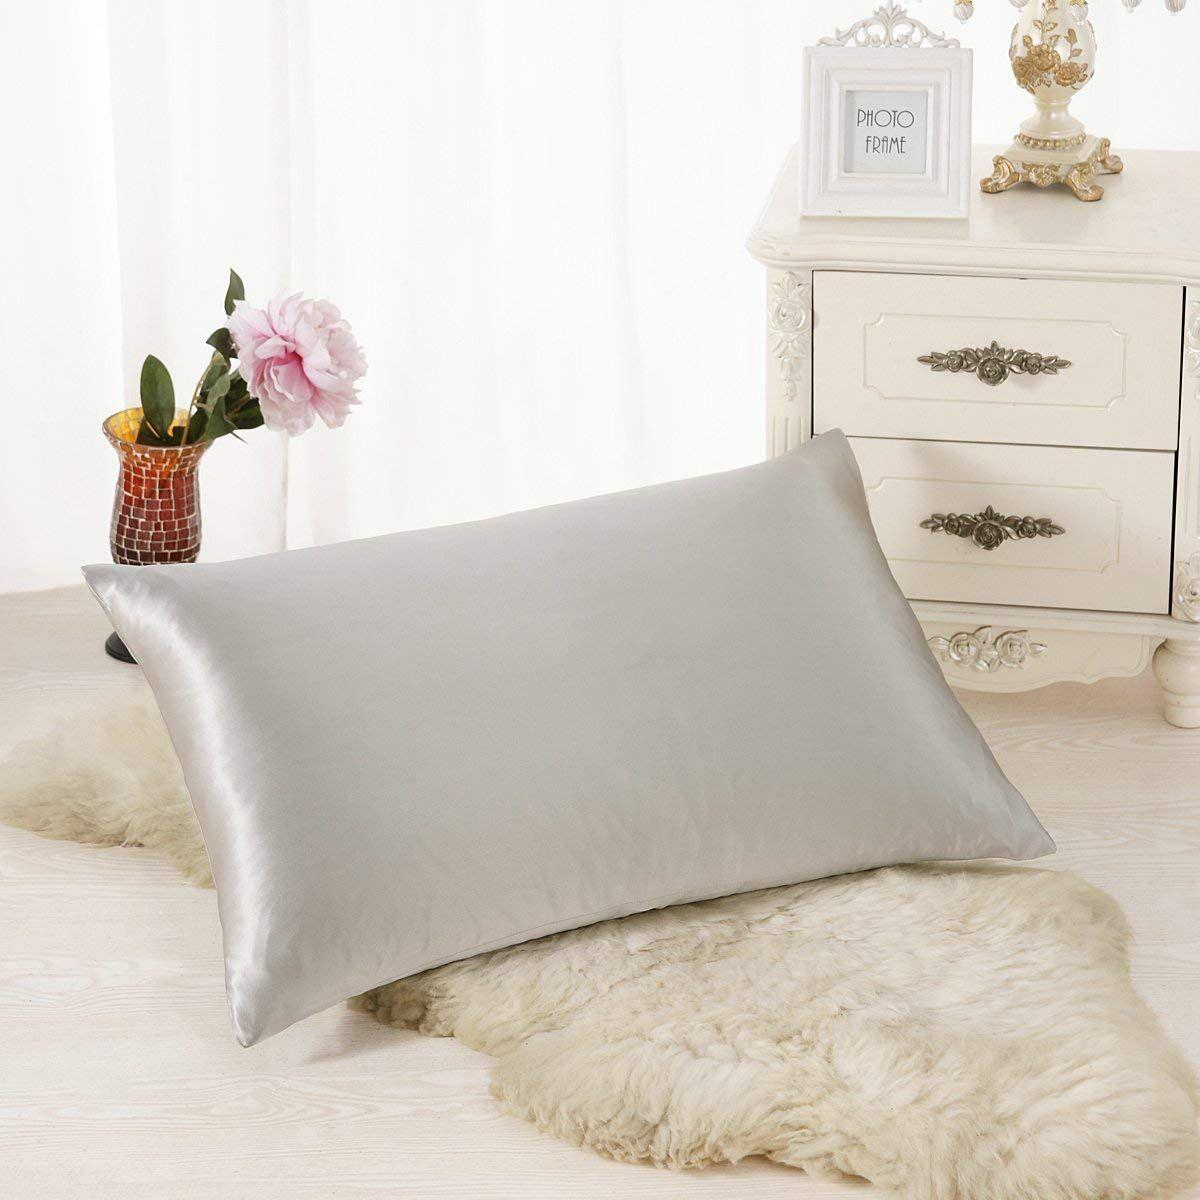 Pin By Arden Kohout On My Wishlist Pillow Cases Silk Pillowcase Satin Pillowcase